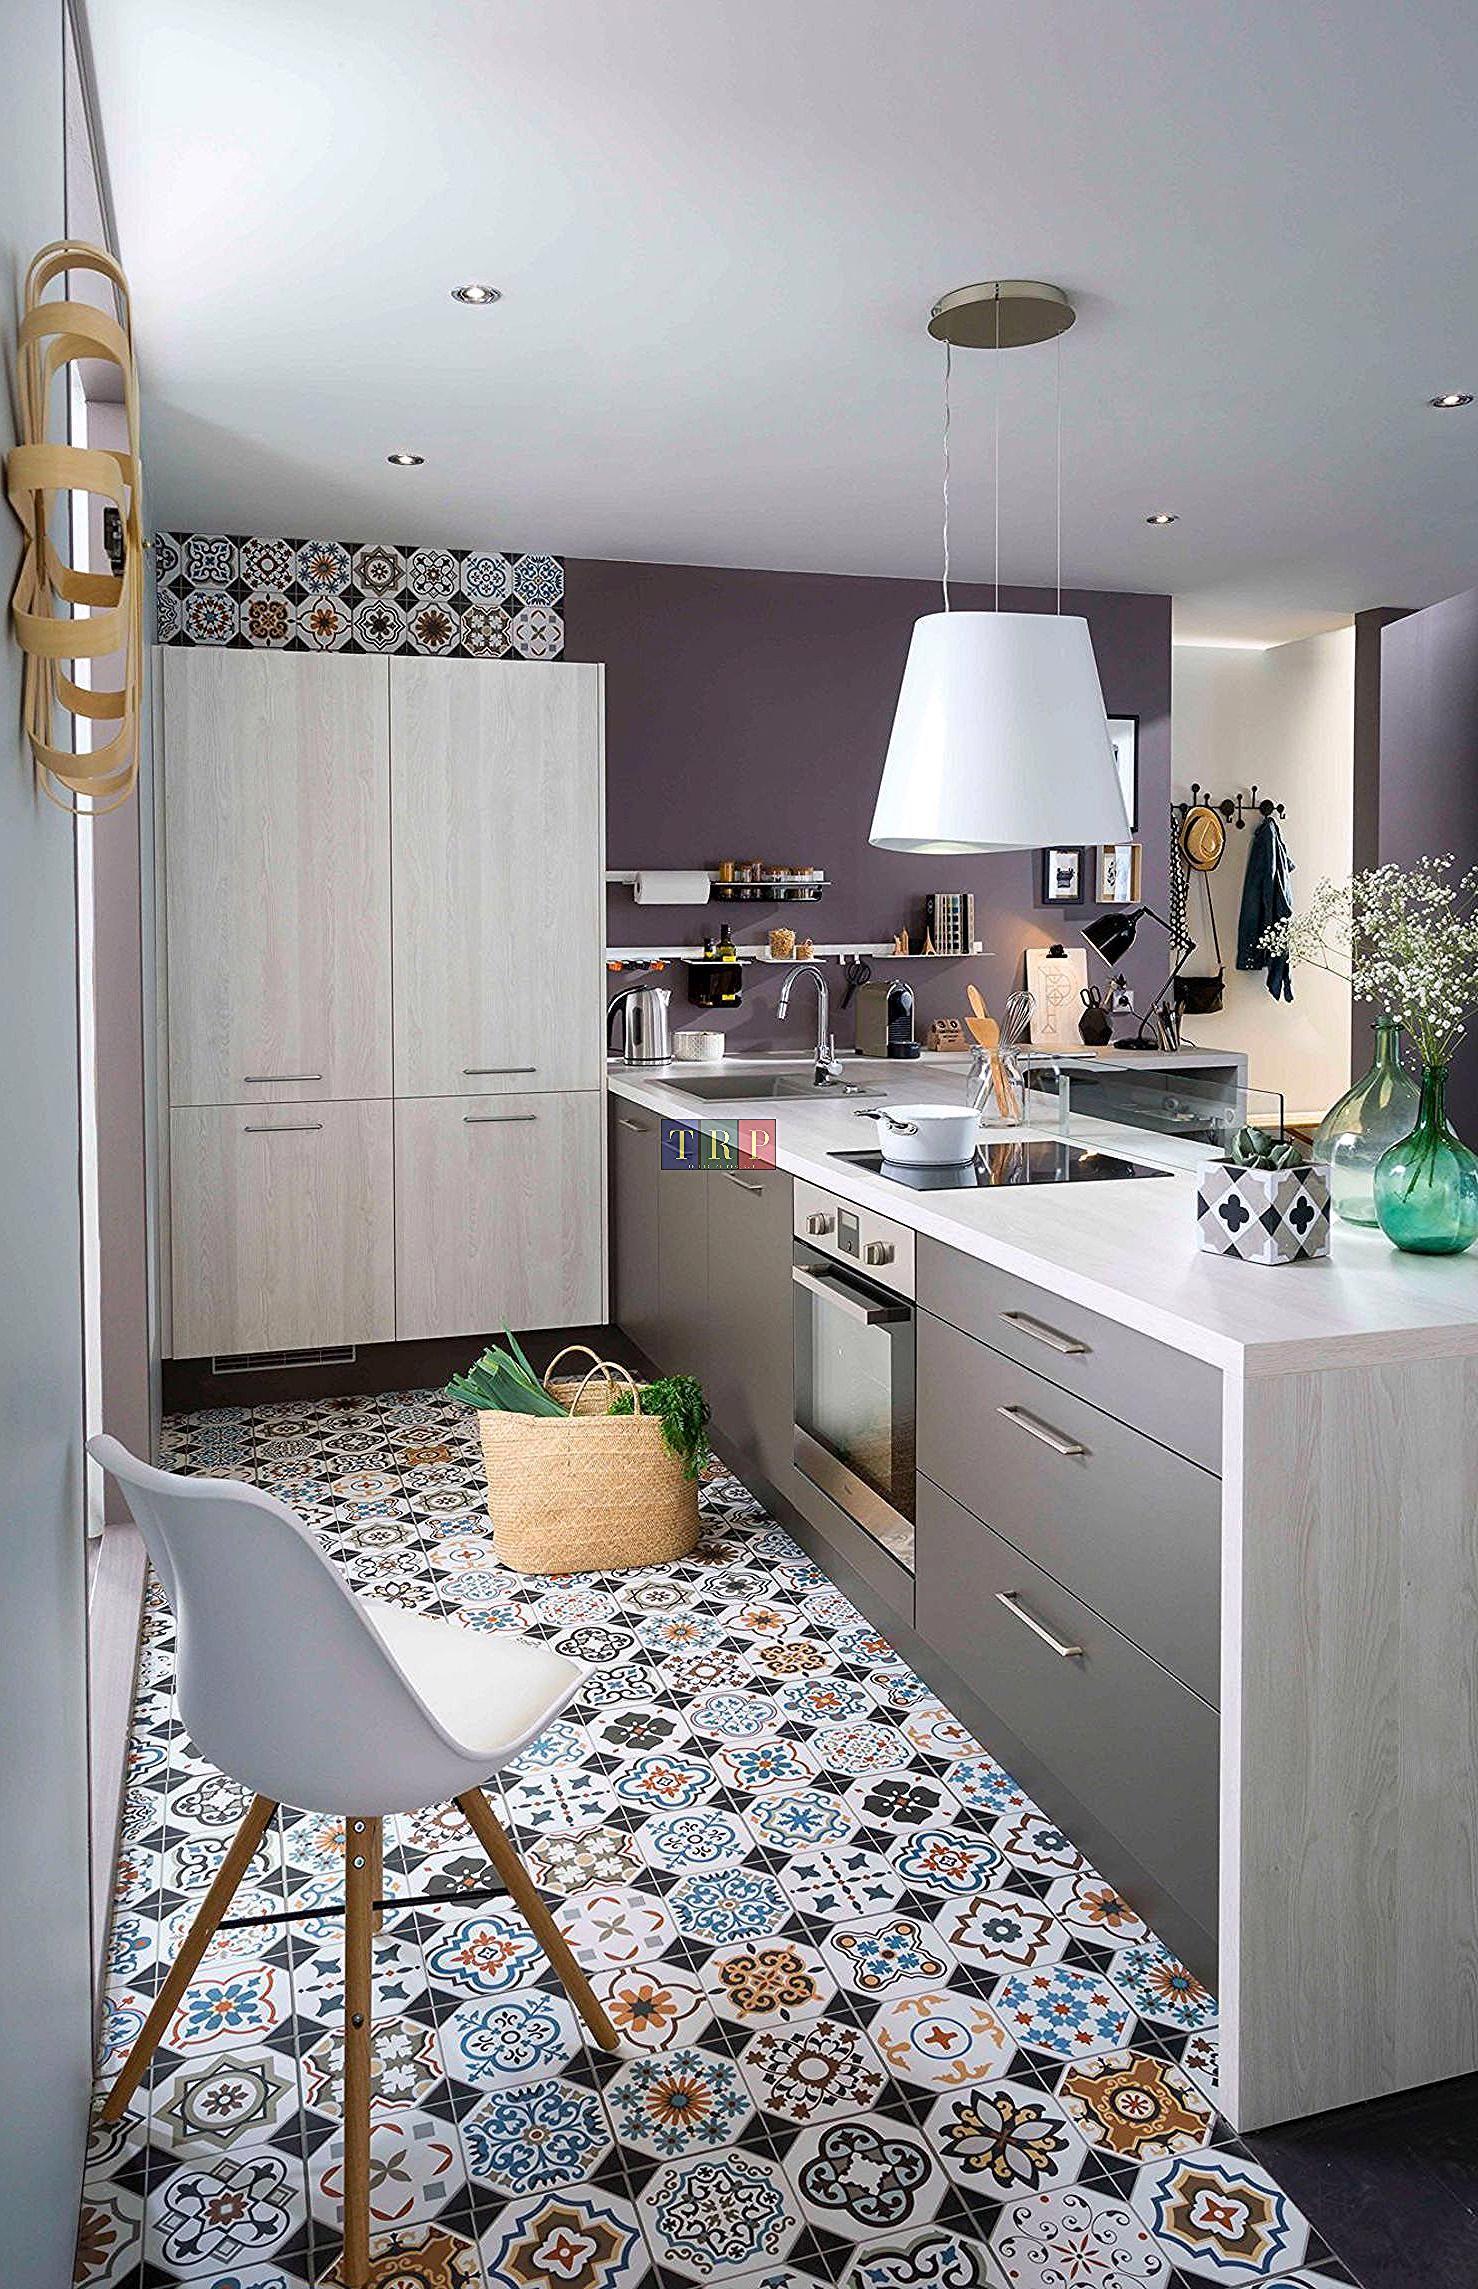 30 Kitchen Floor Tile Ideas Best Of Remodeling Kitchen Tiles In Modern Retro And Vin In 2020 Kitchen Flooring Kitchen Flooring Ideas Inexpensive Kitchen Floor Tile